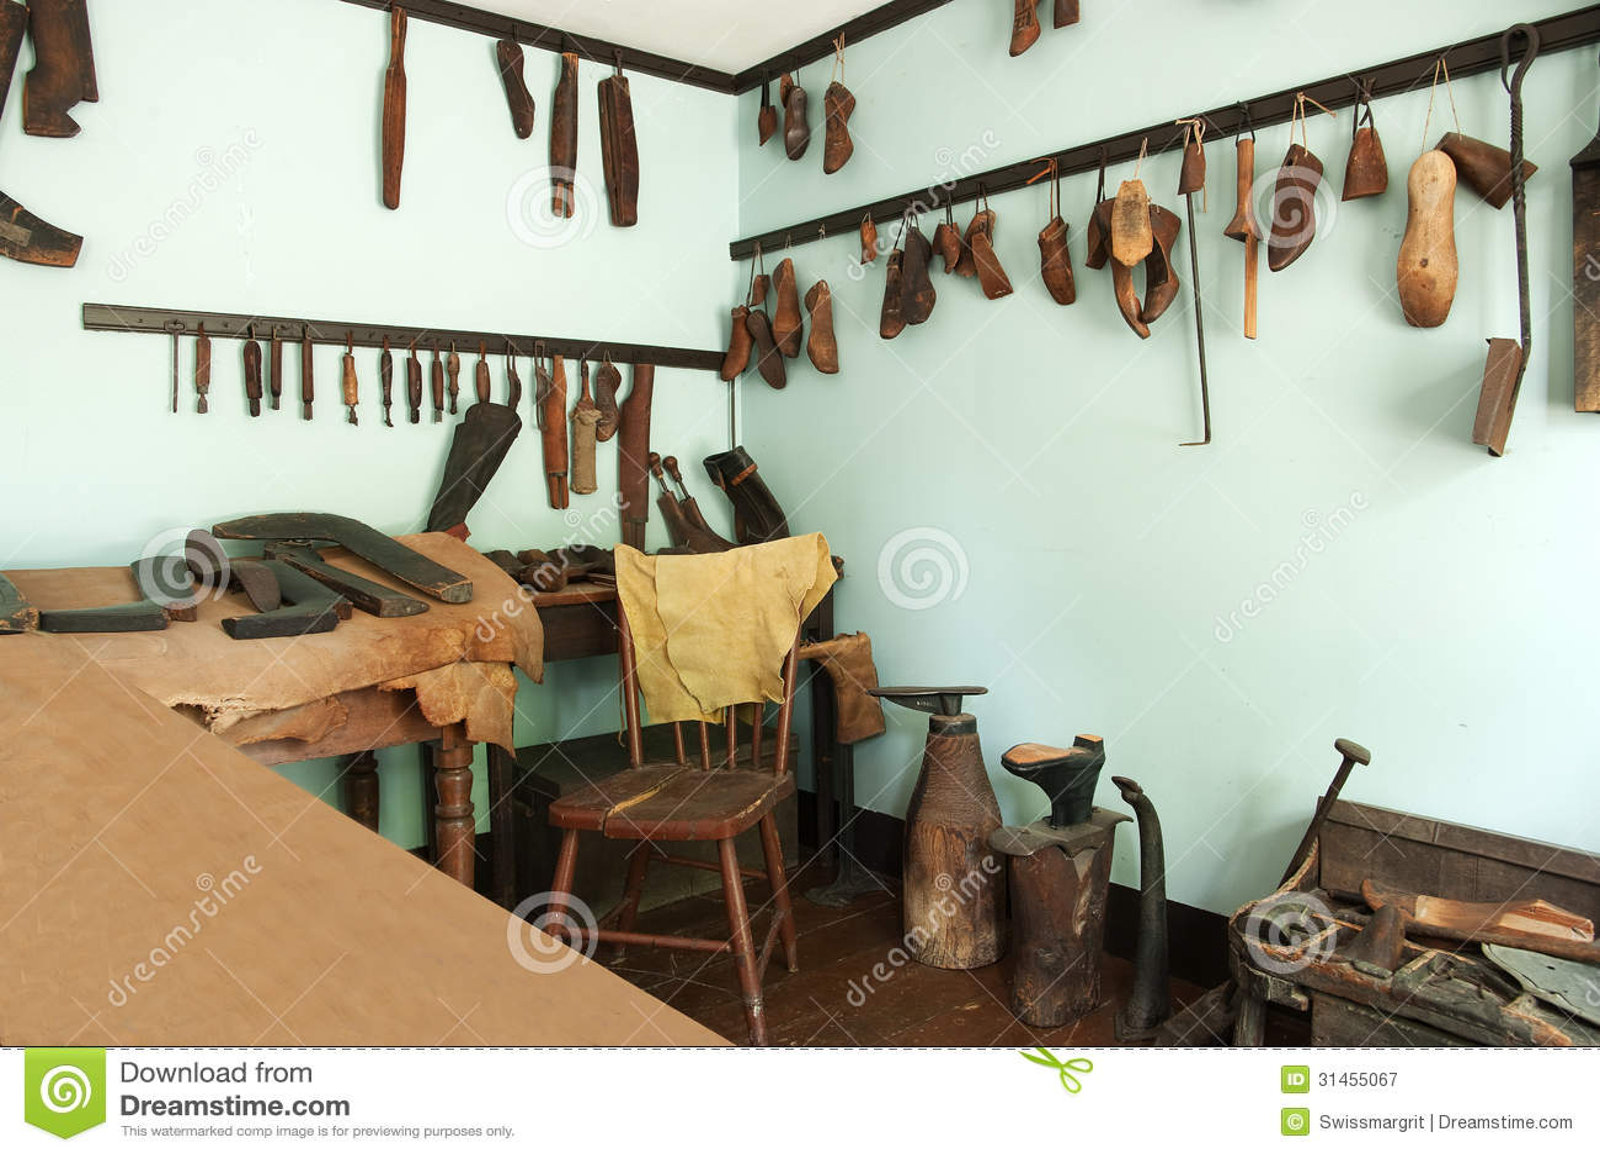 Vintage shoe shop stock image. Image of